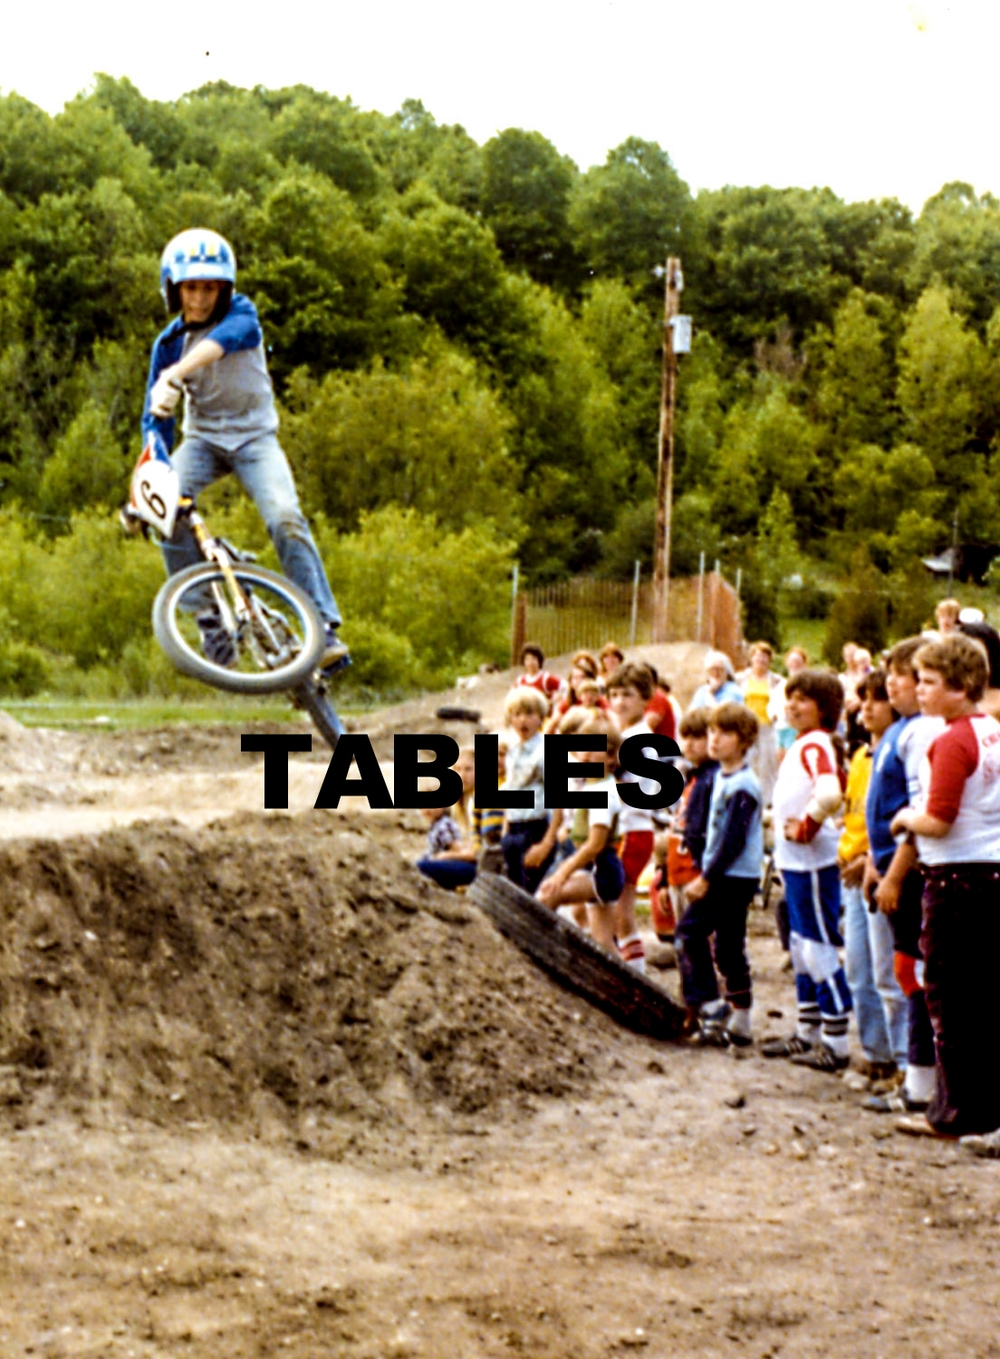 BMX Jumping in Petosky